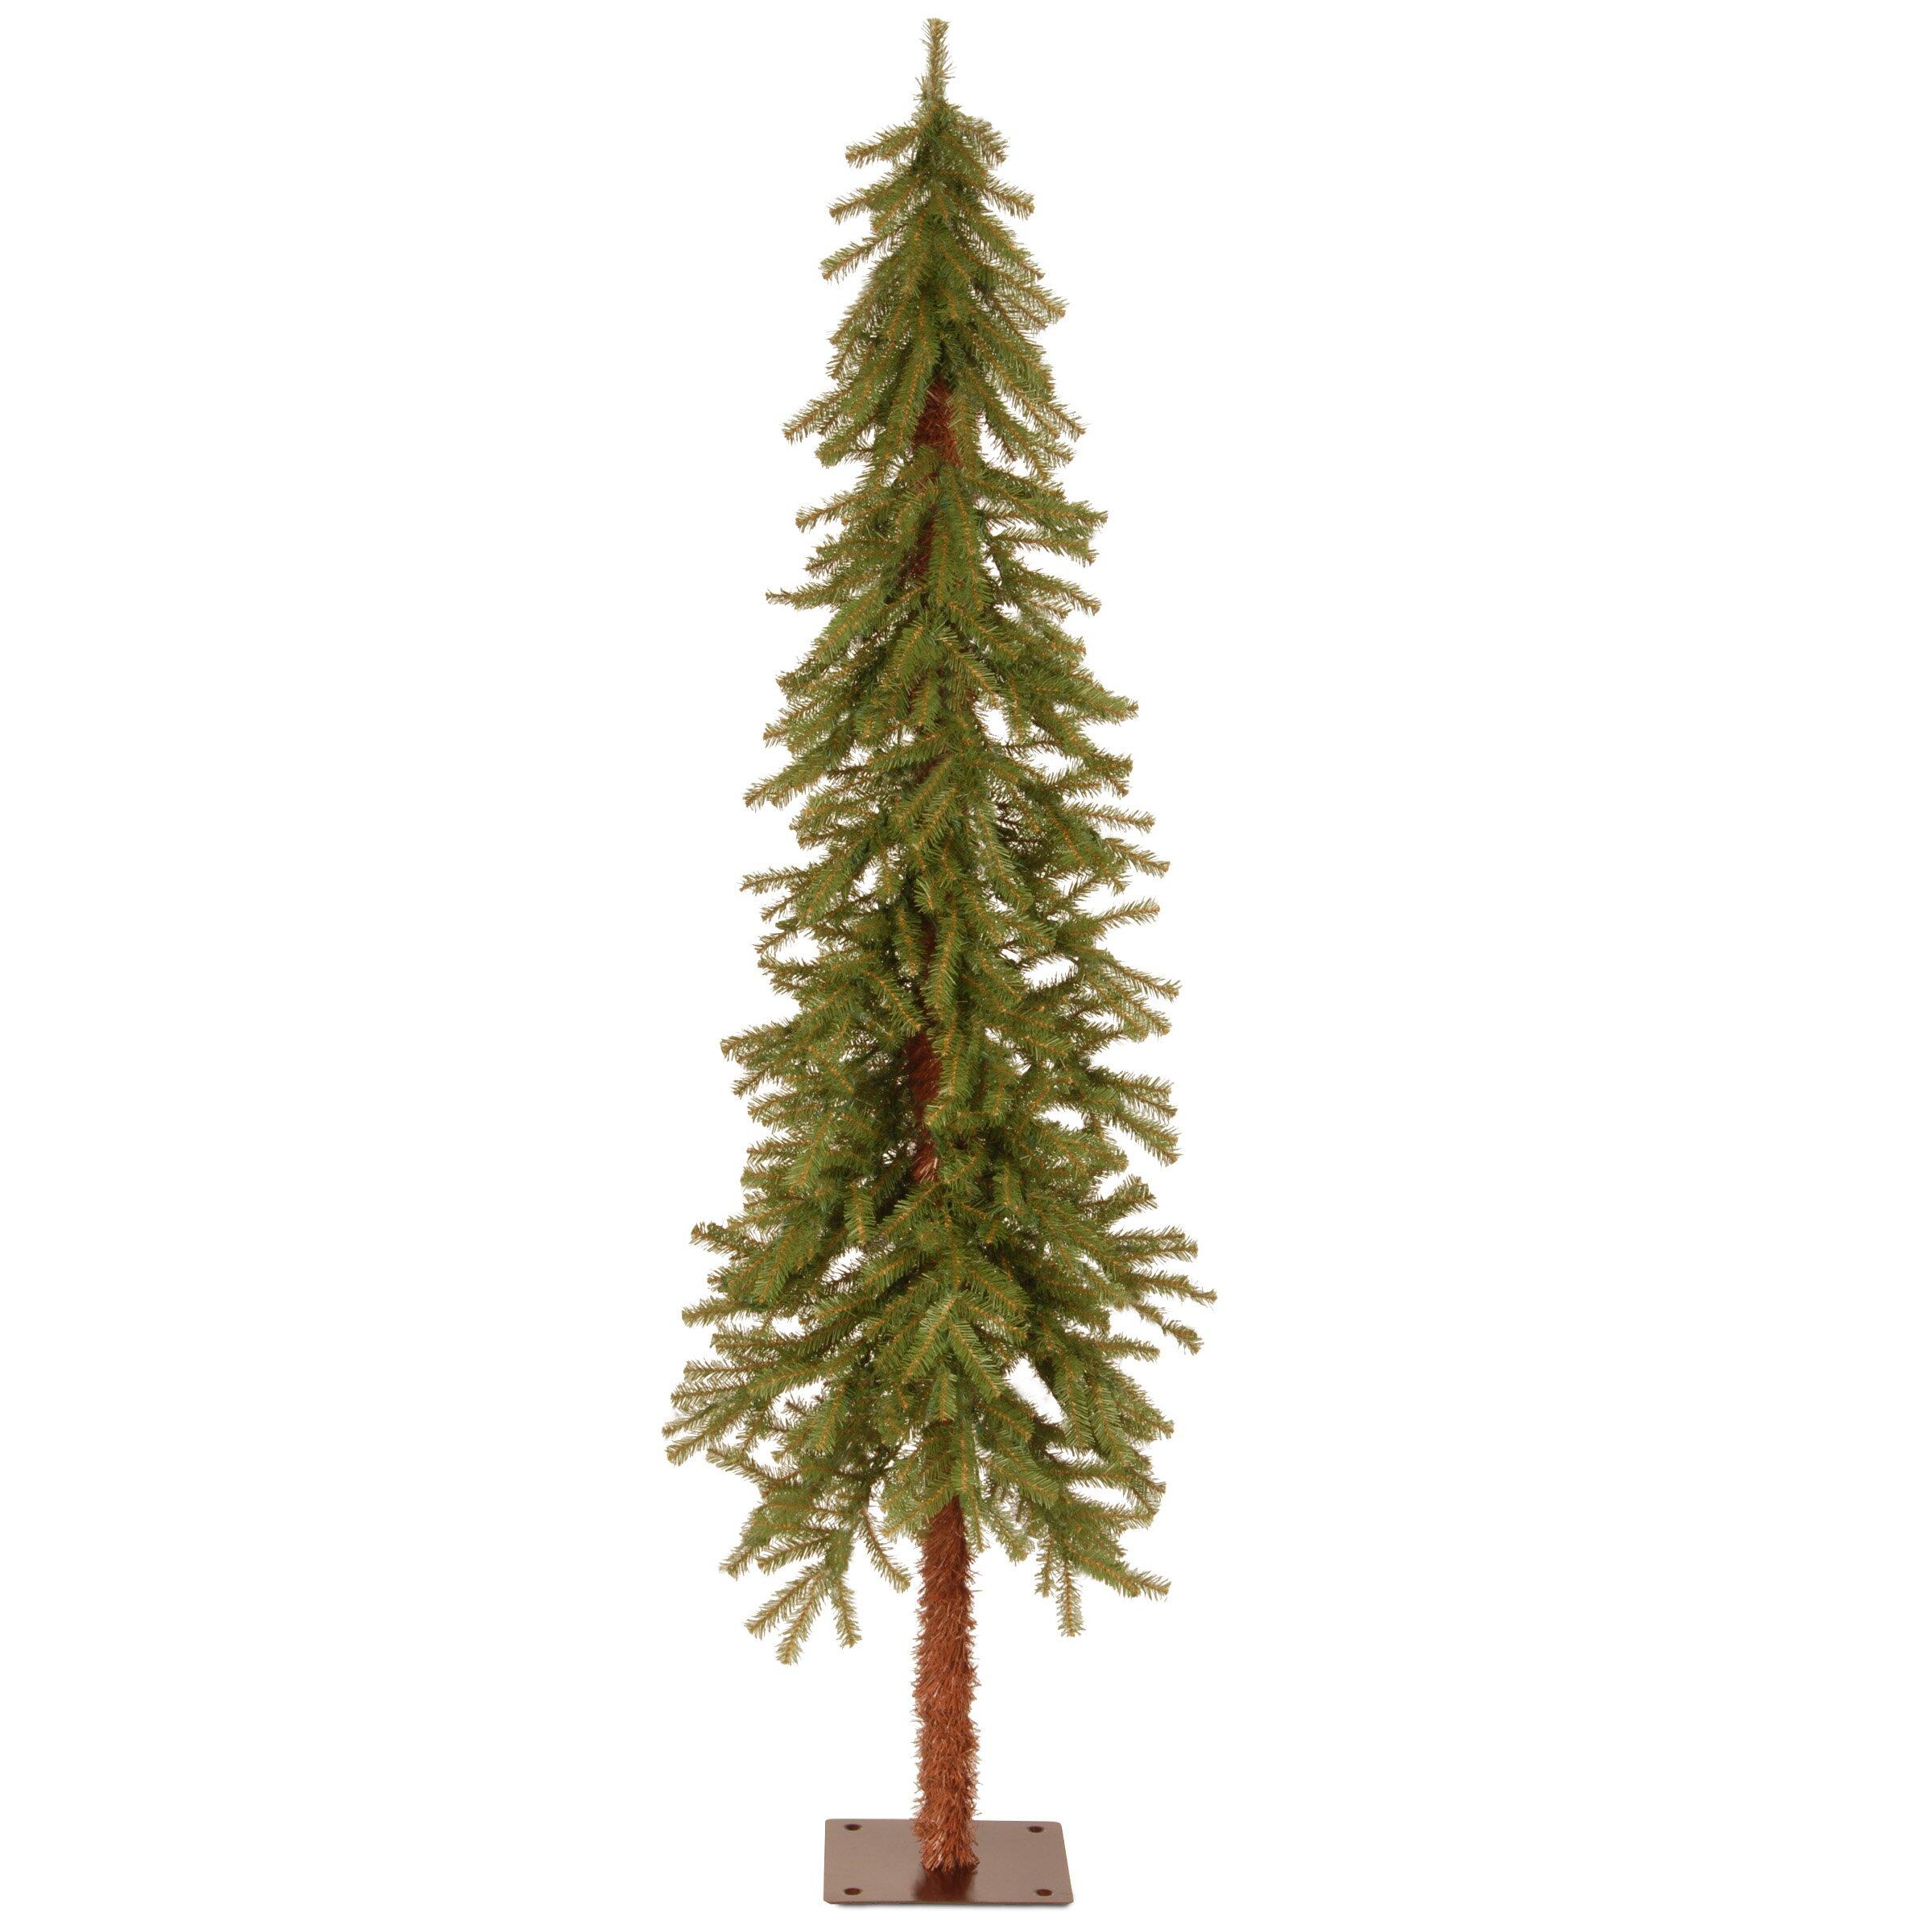 Christmas Tree Company Greytown : National tree co hickory cedar green artificial